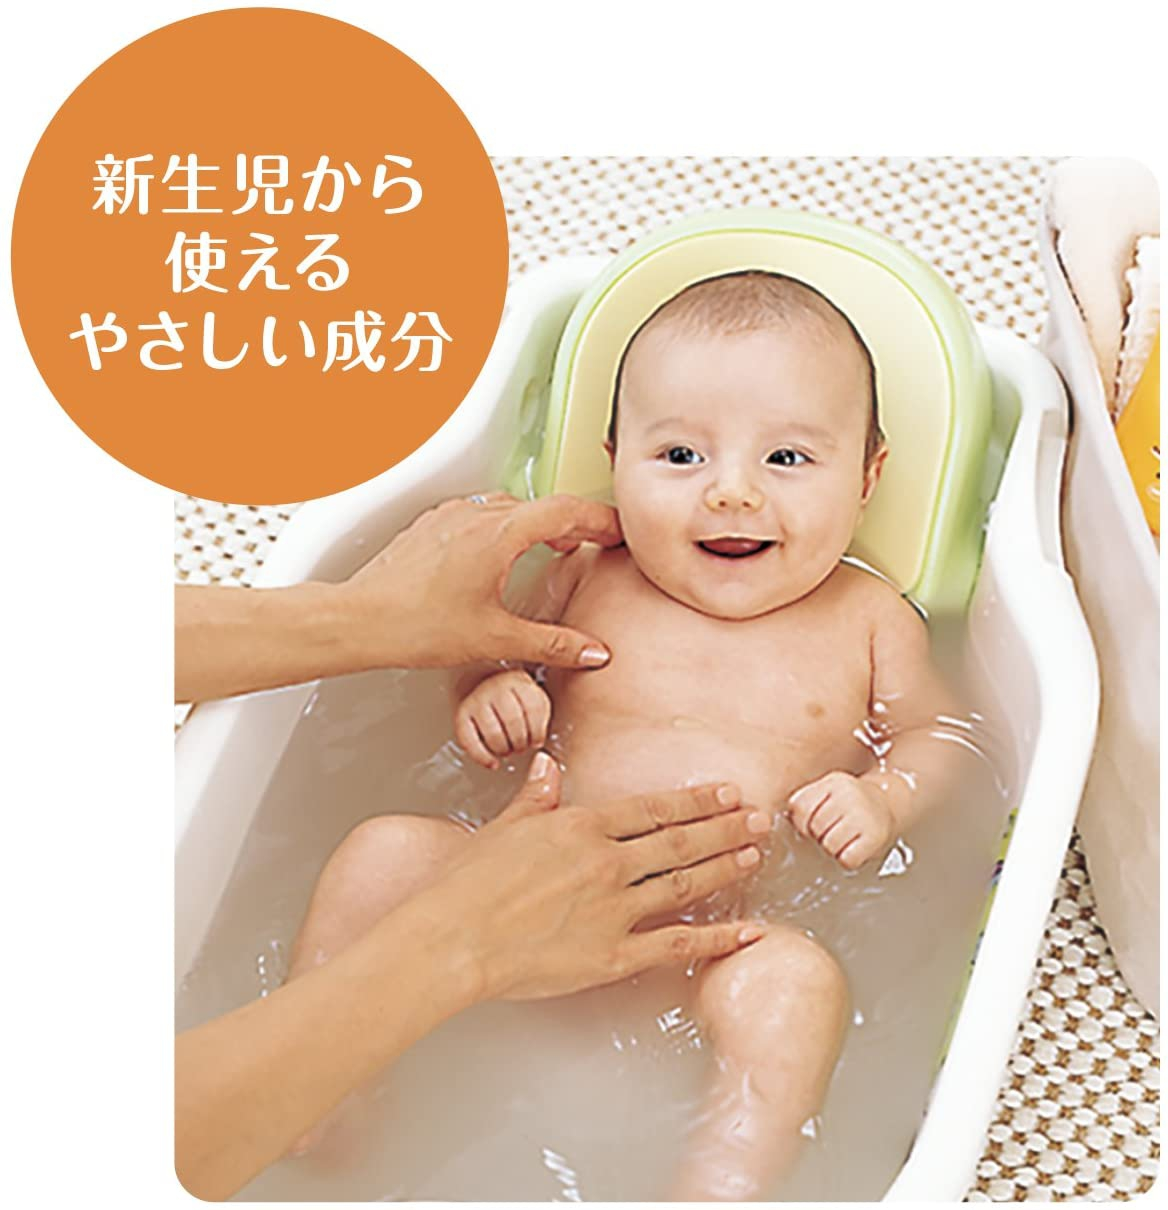 MADONNA(マドンナ)ベビーバーユマドンナ沐浴剤の商品画像4